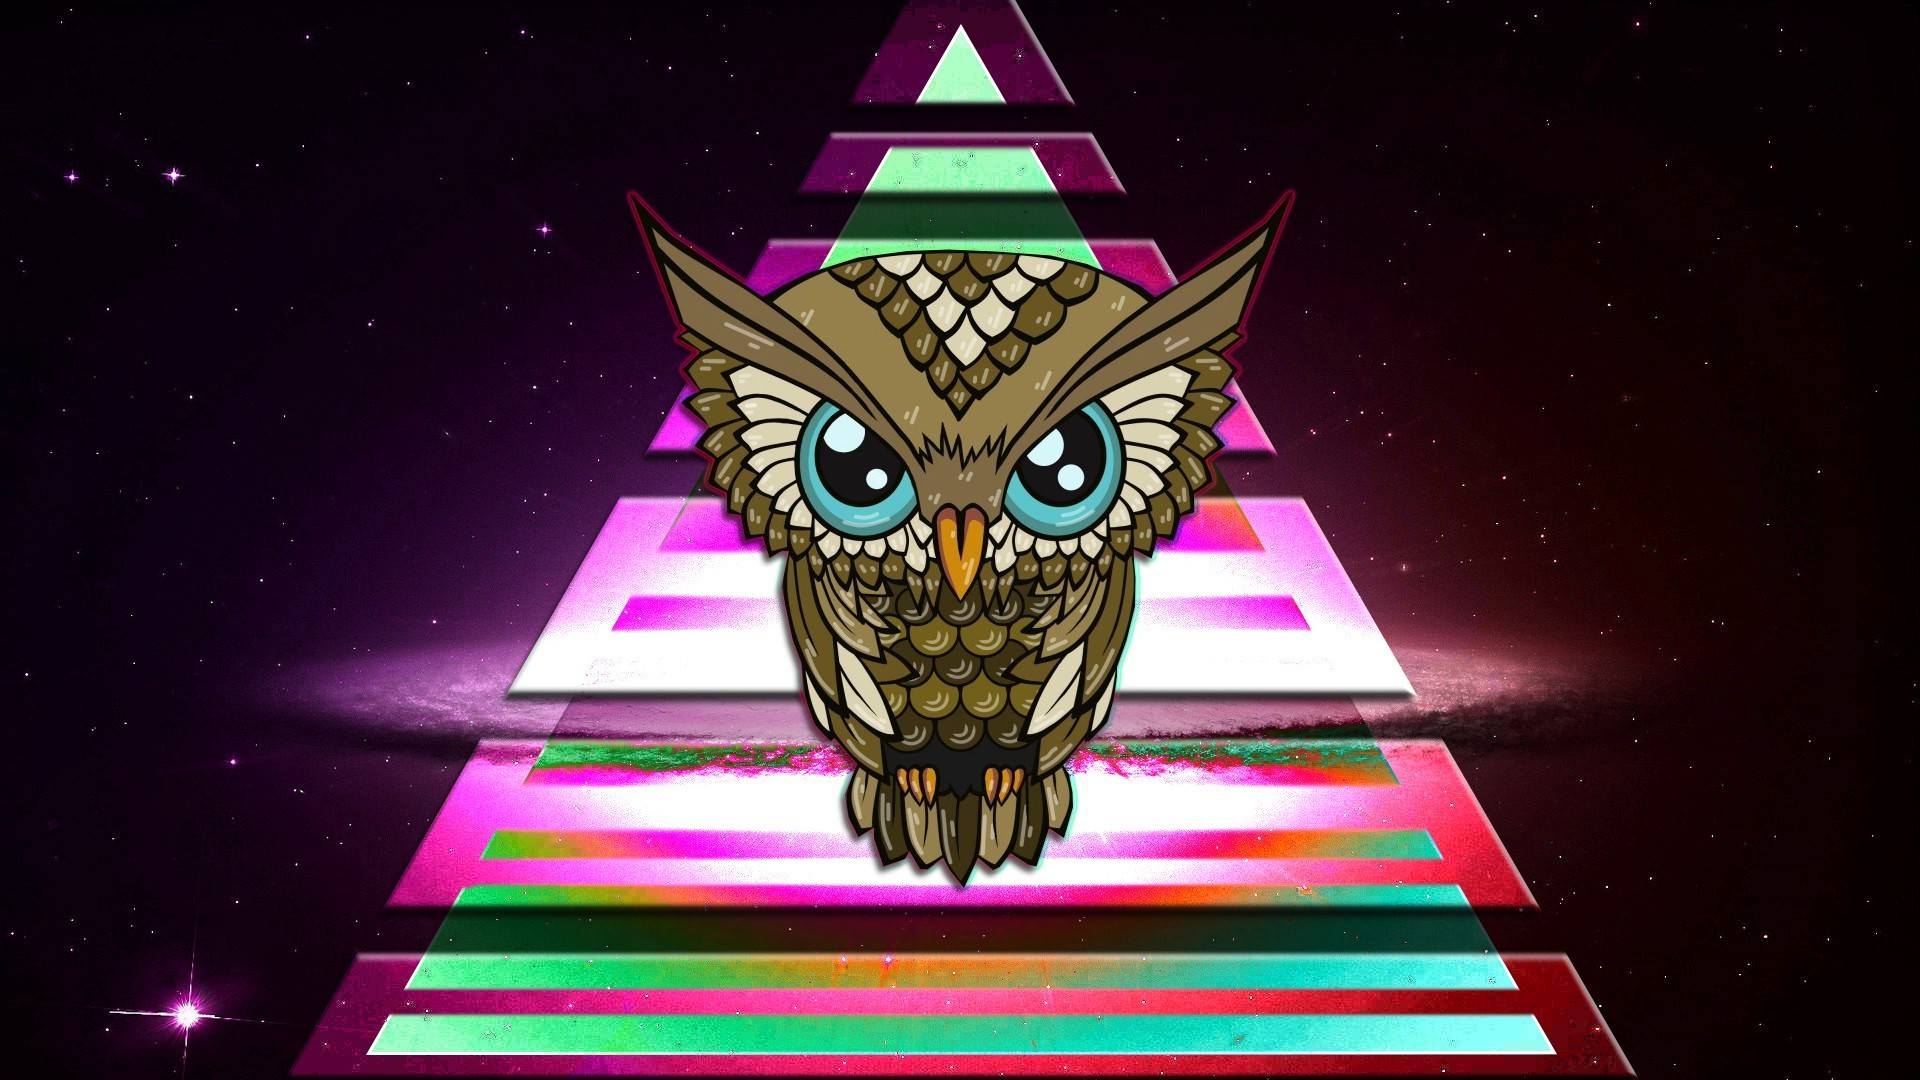 illuminati wallpaper Tumblr